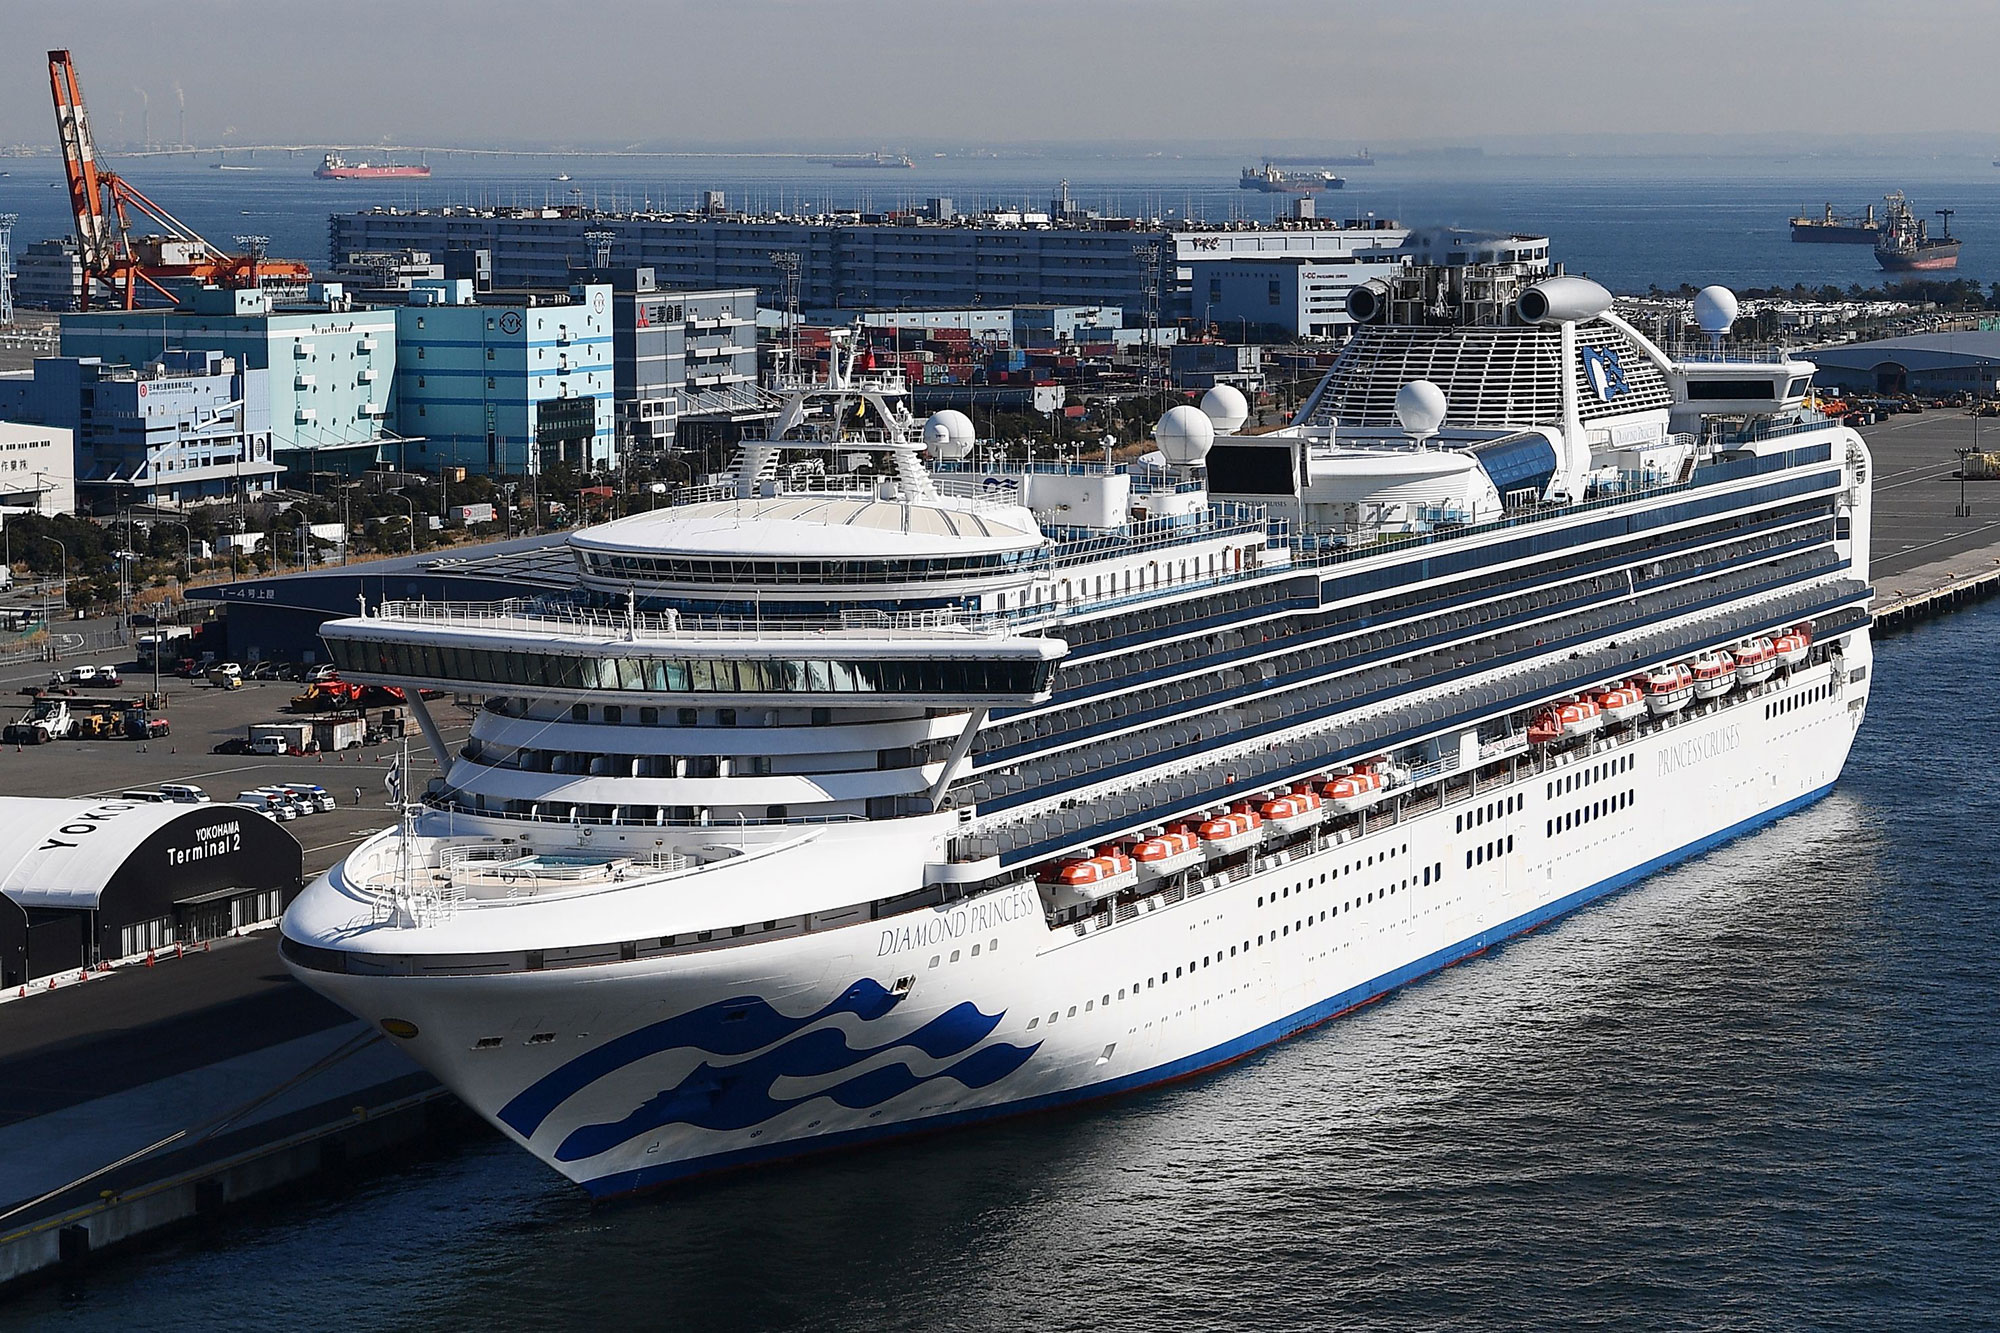 The Diamond Princess is quarantined at the port city of Yokohama, Japan.